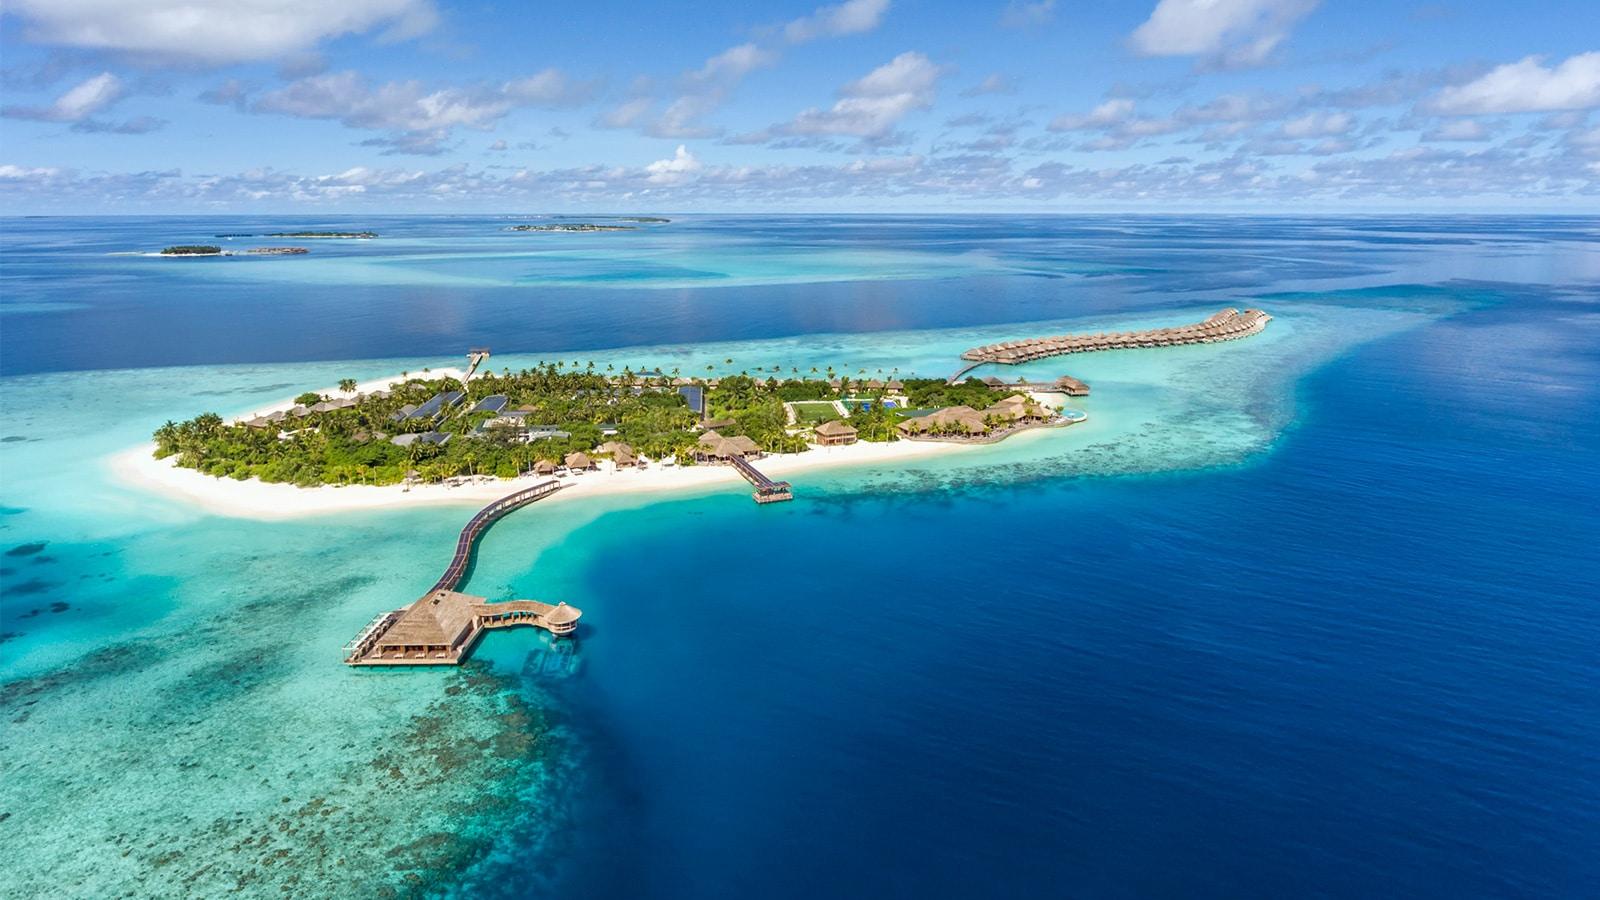 Où atterrir aux Maldives?